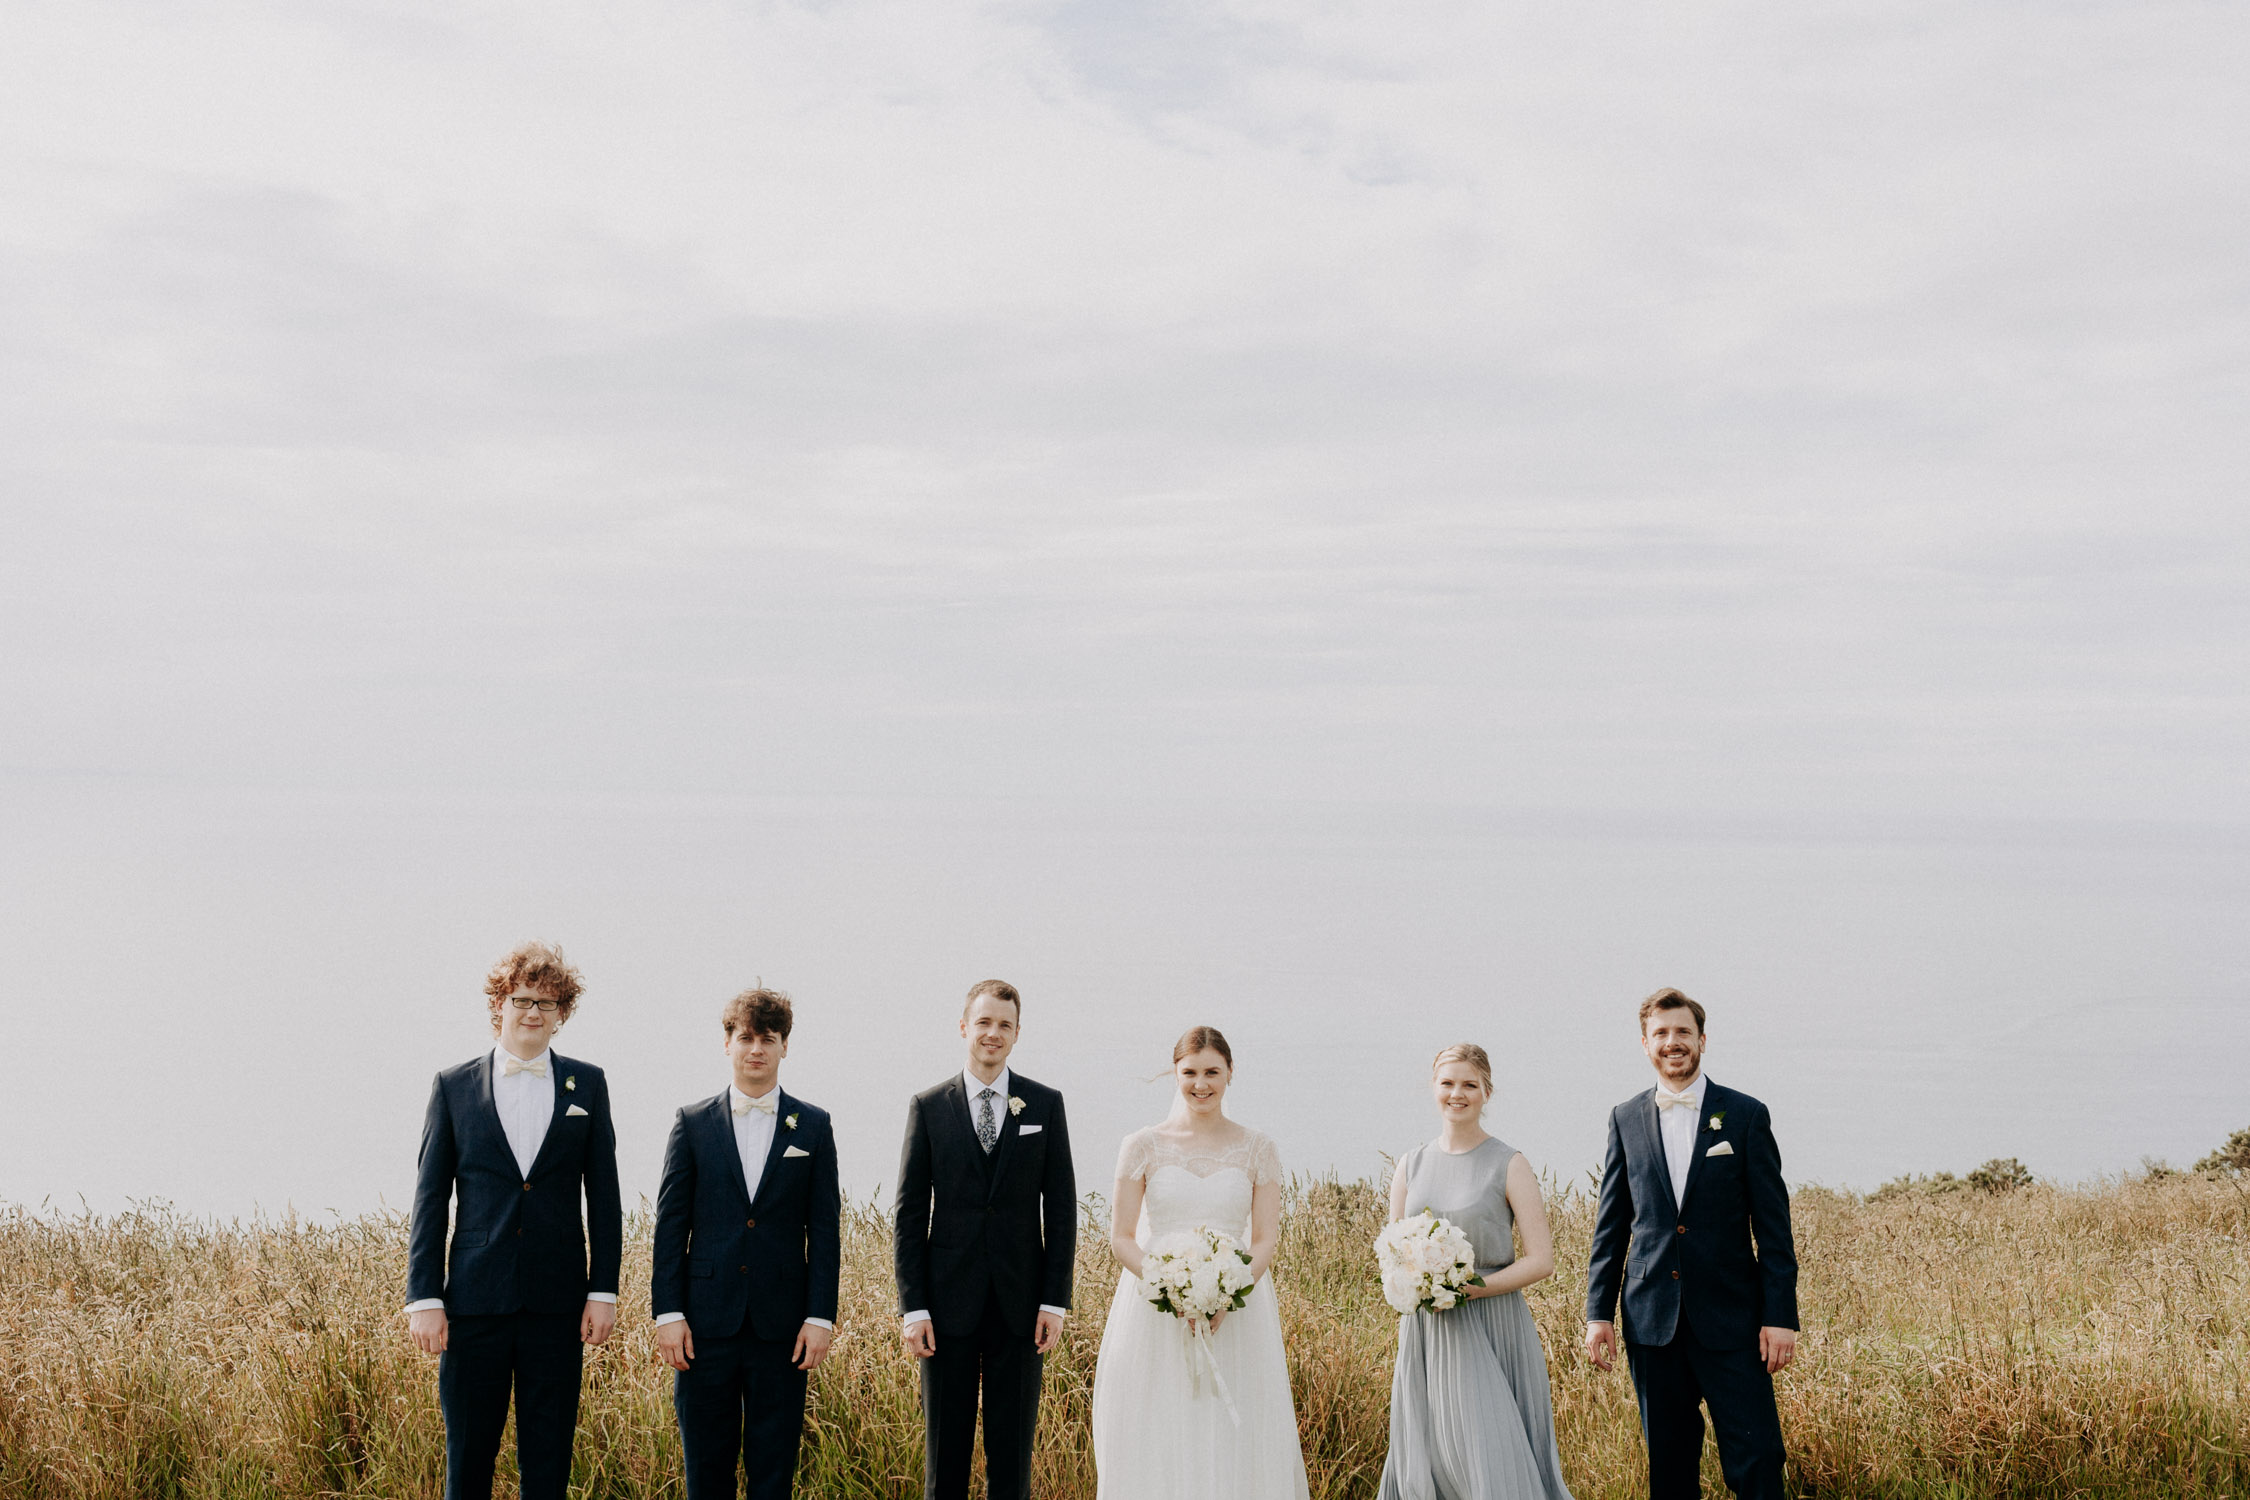 Boomrock bridal party photos